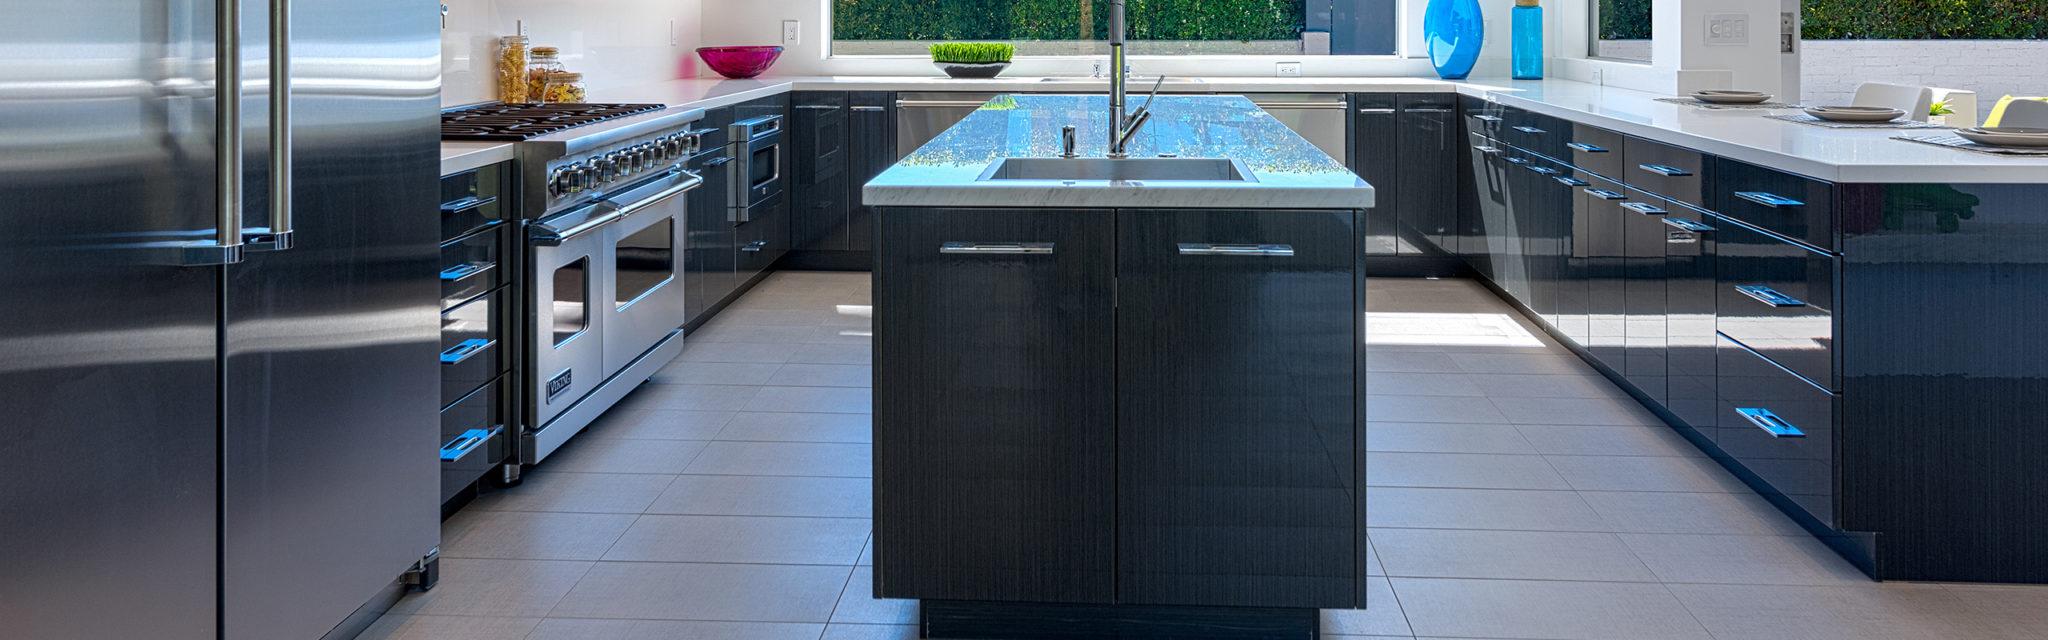 Modern Kitchen Remodel Style for 2019 Las Vegas